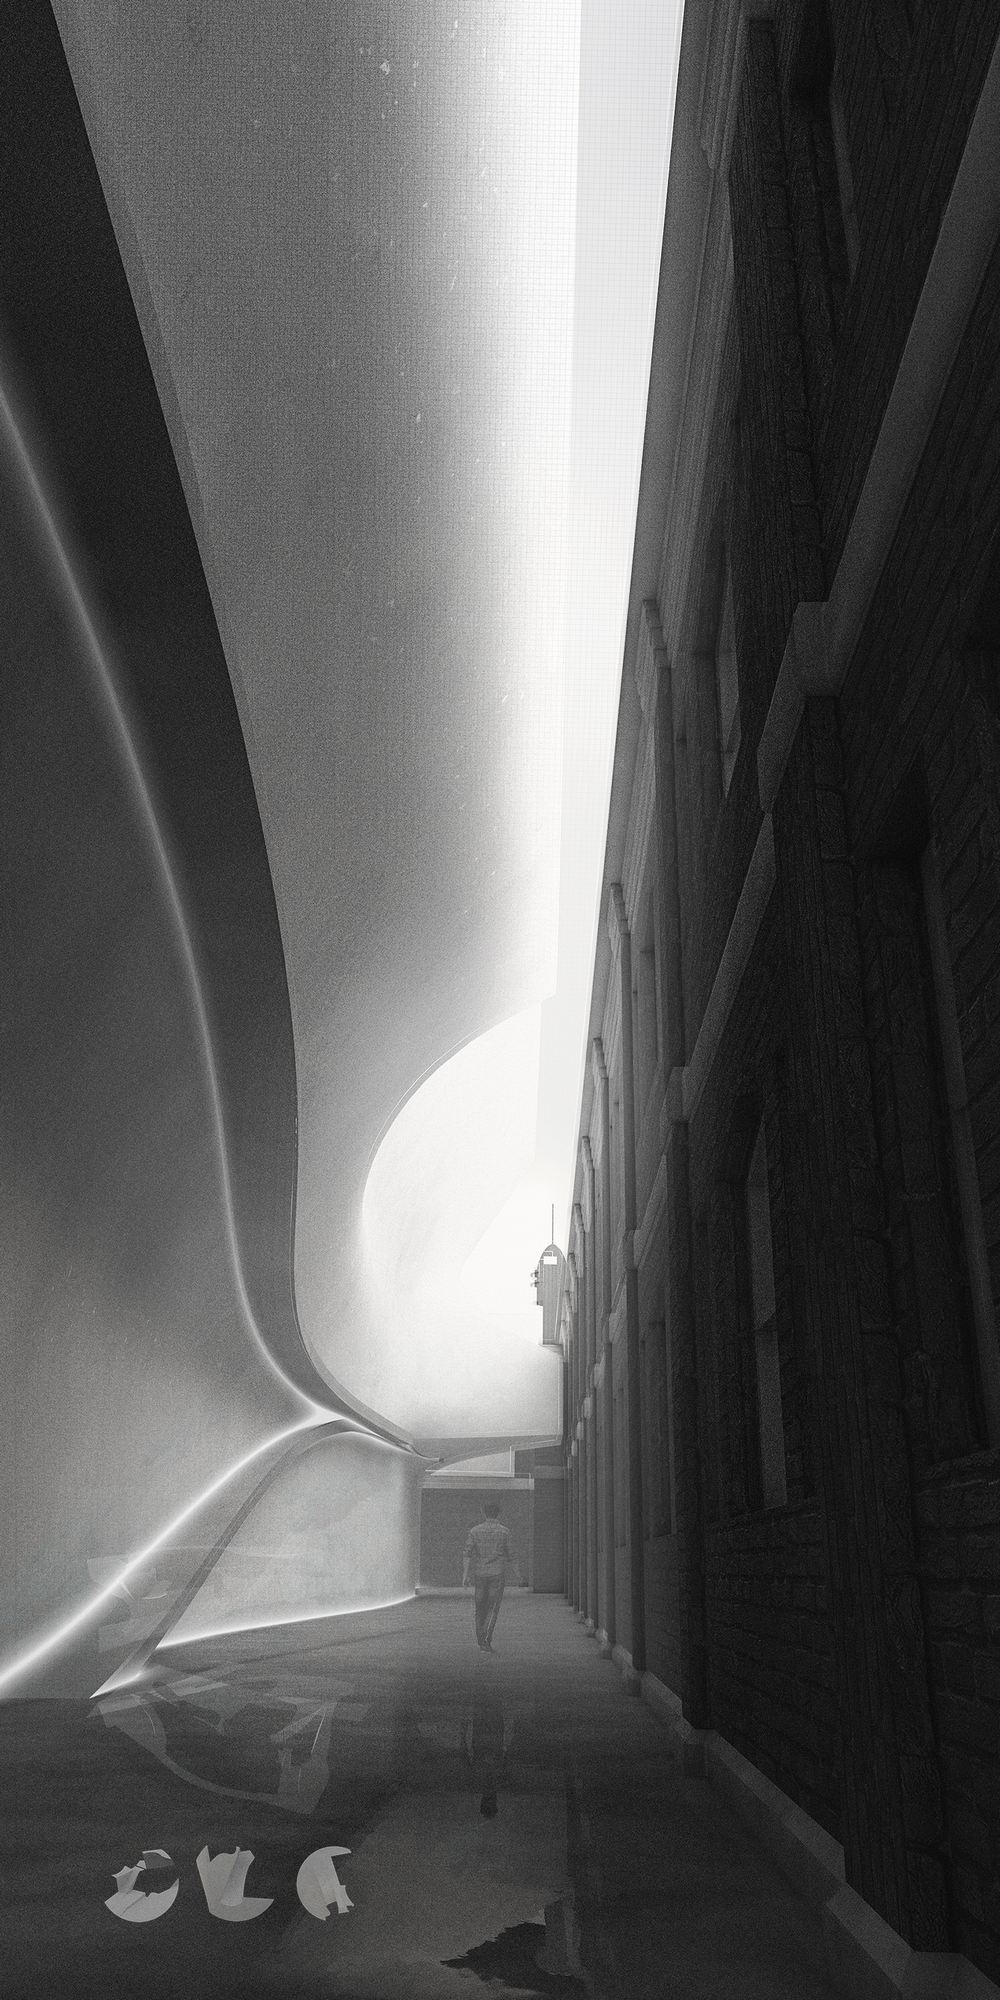 Interstitial Passage-Bridge between the Past & Present_James Feng Design_Sydney Freelance Designer